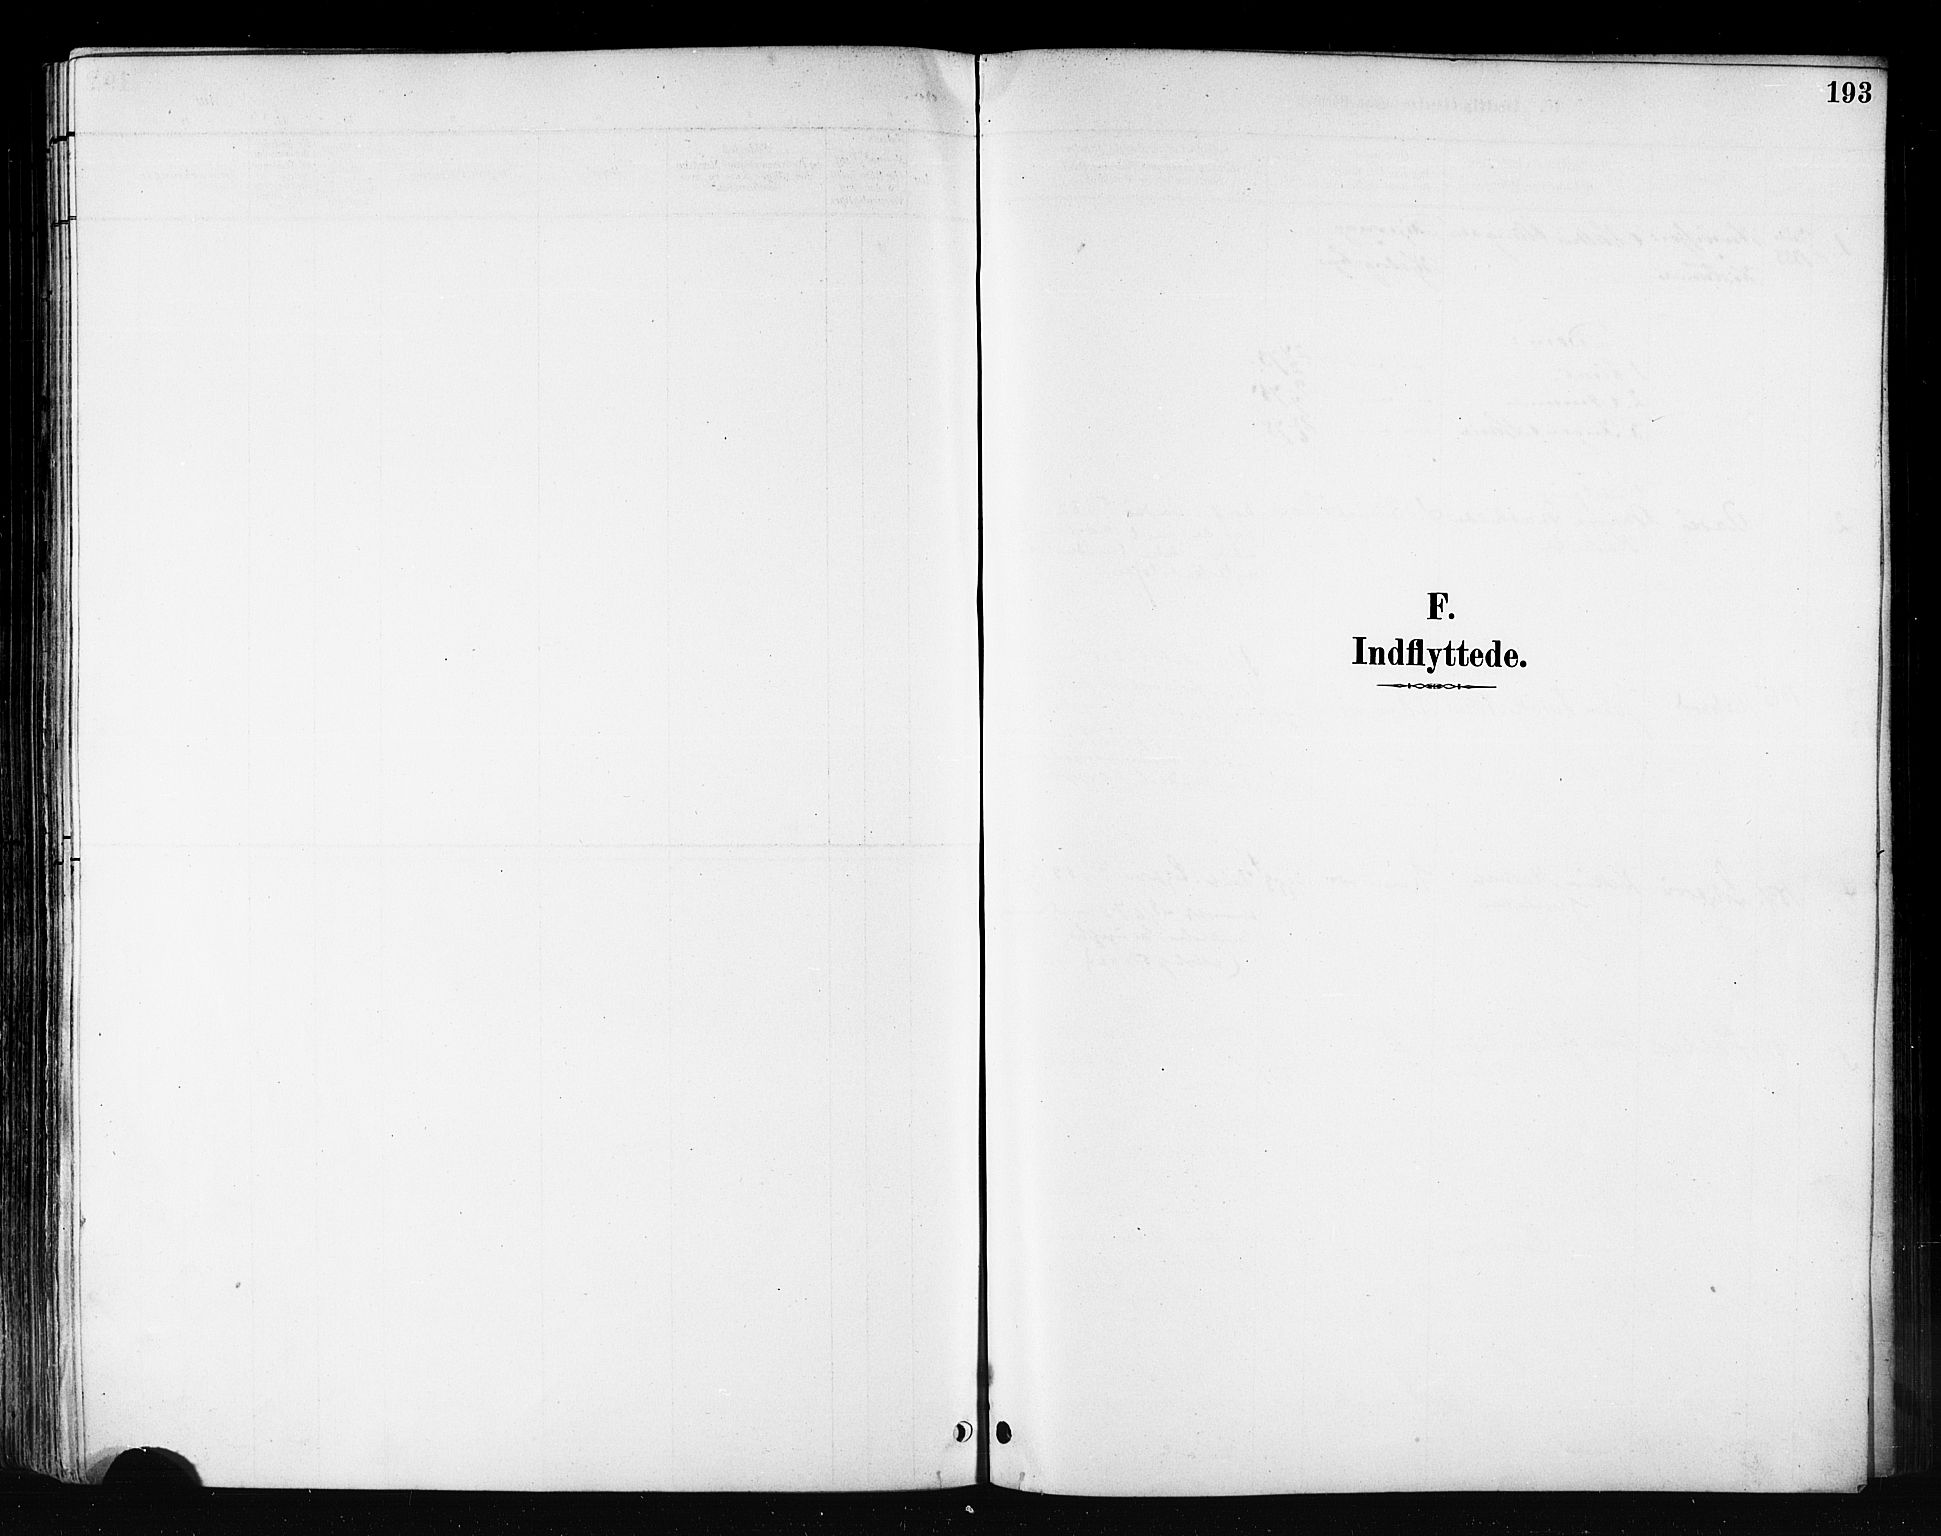 SATØ, Måsøy sokneprestkontor, H/Ha/L0007kirke: Ministerialbok nr. 7, 1887-1899, s. 193